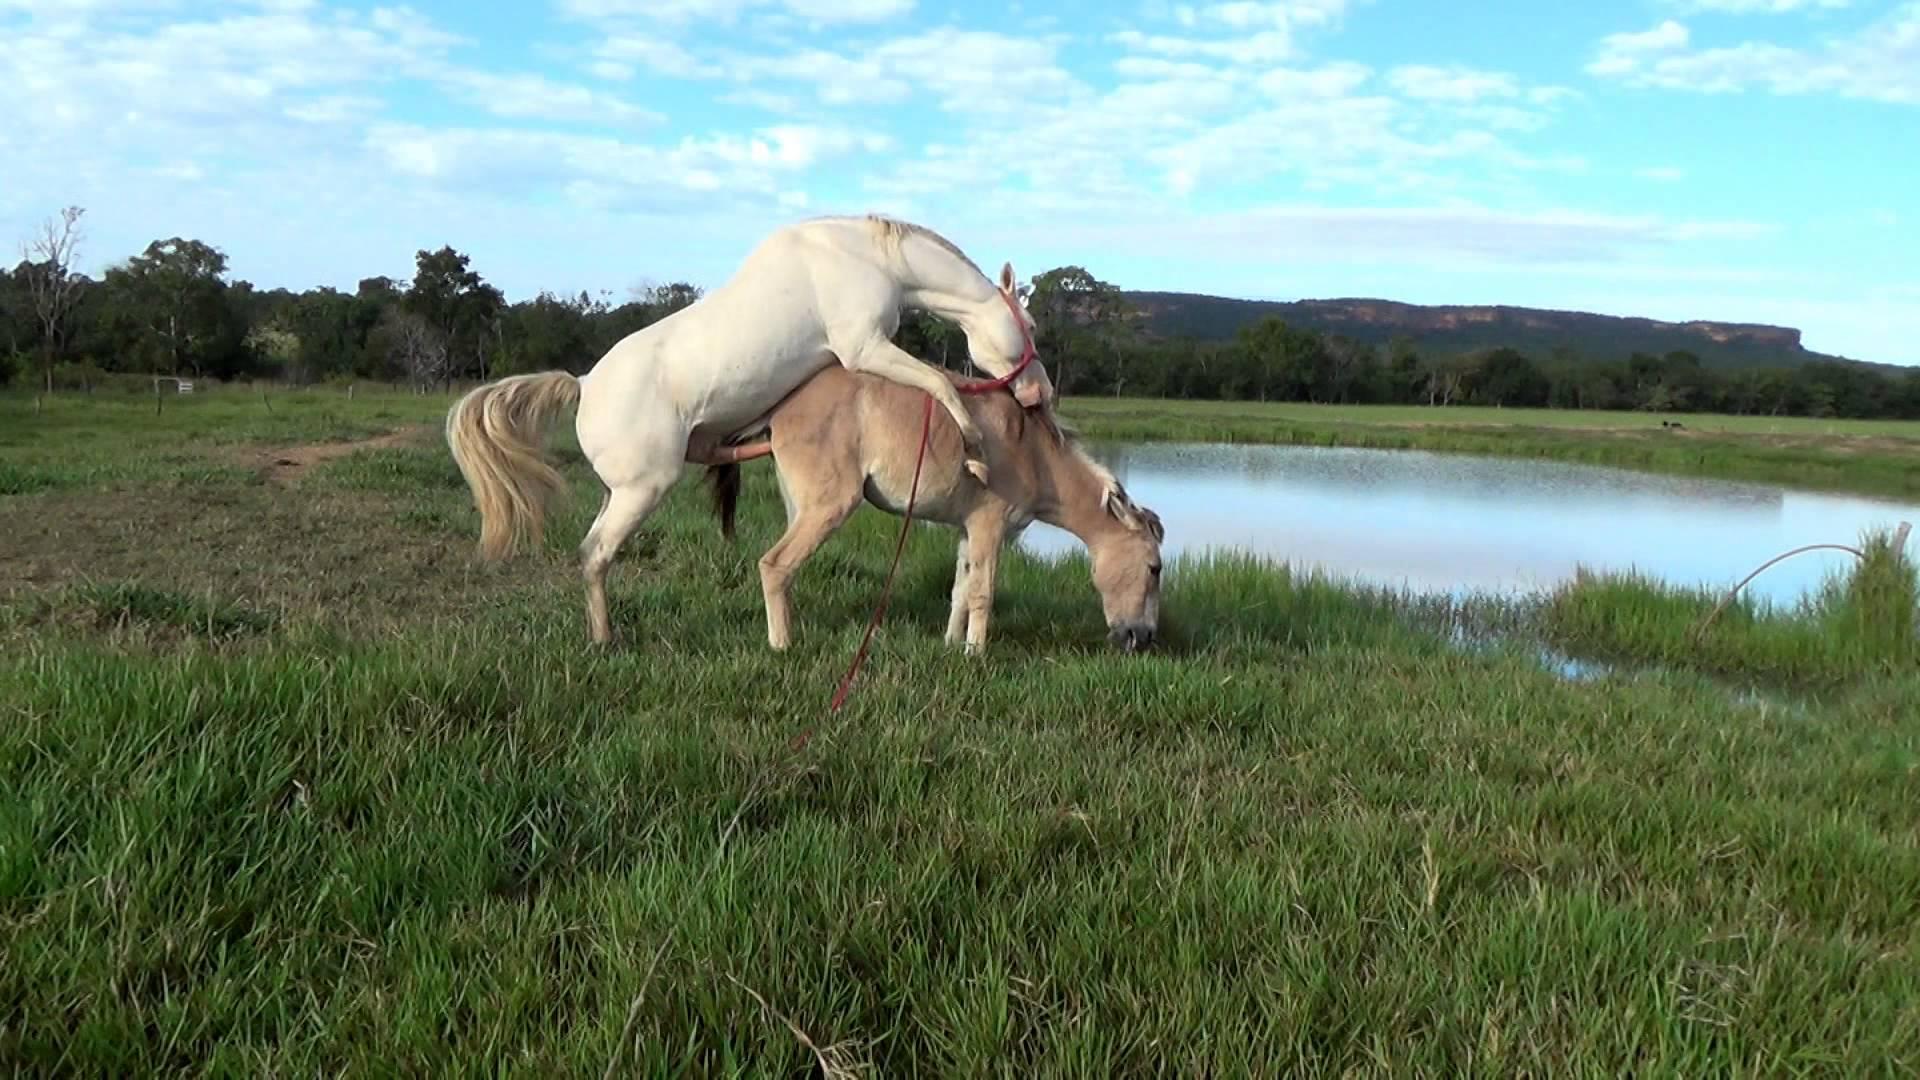 Horse Mating